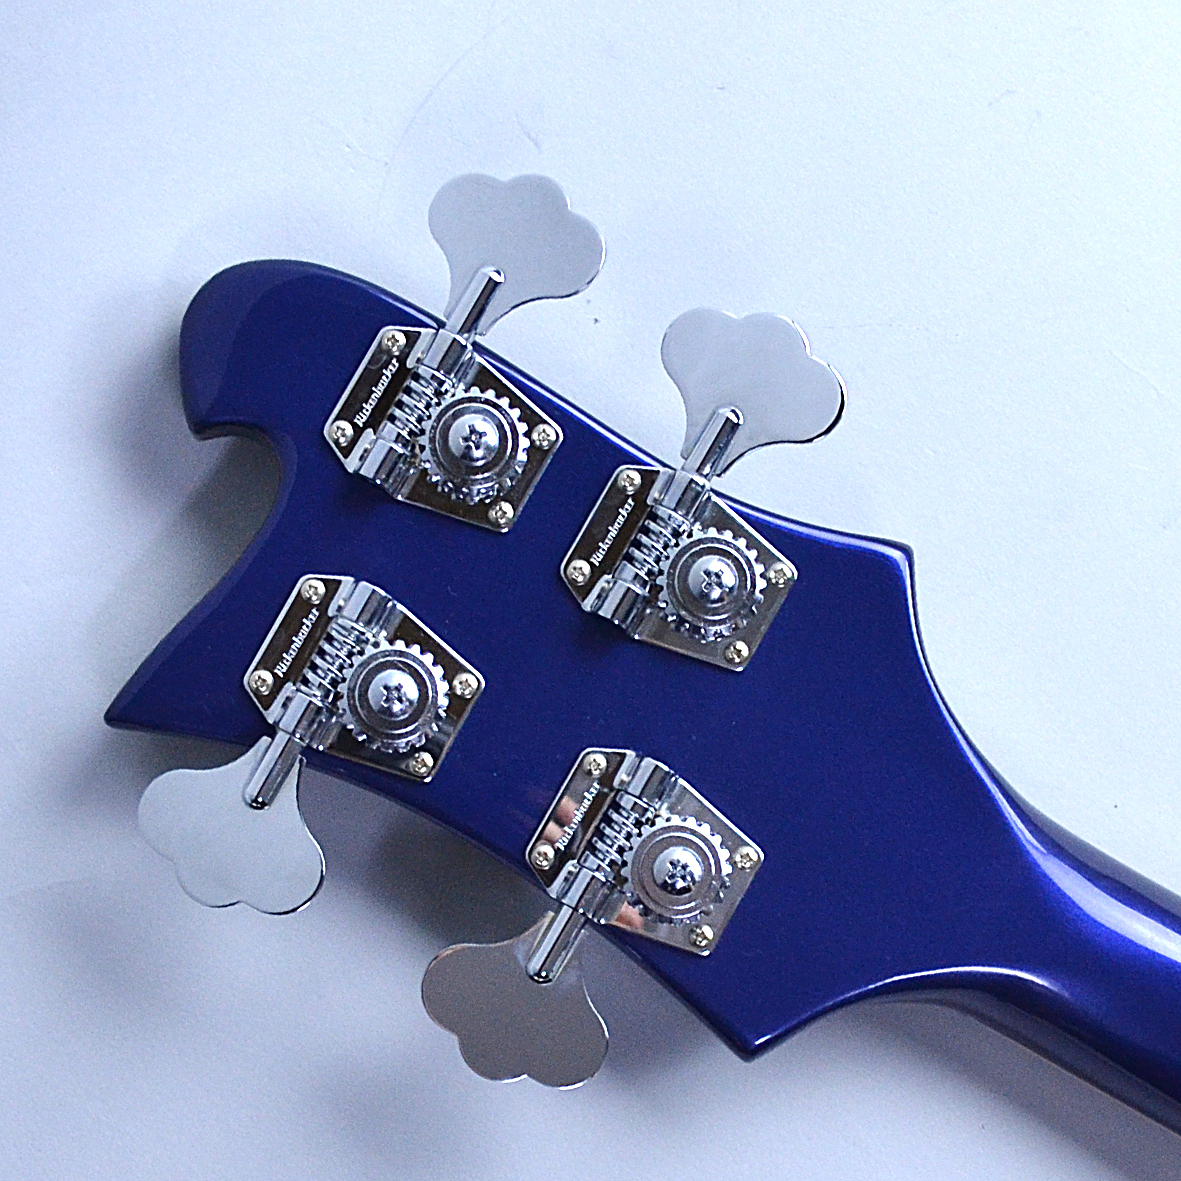 Rickenbacker 4003のヘッド裏-アップ画像